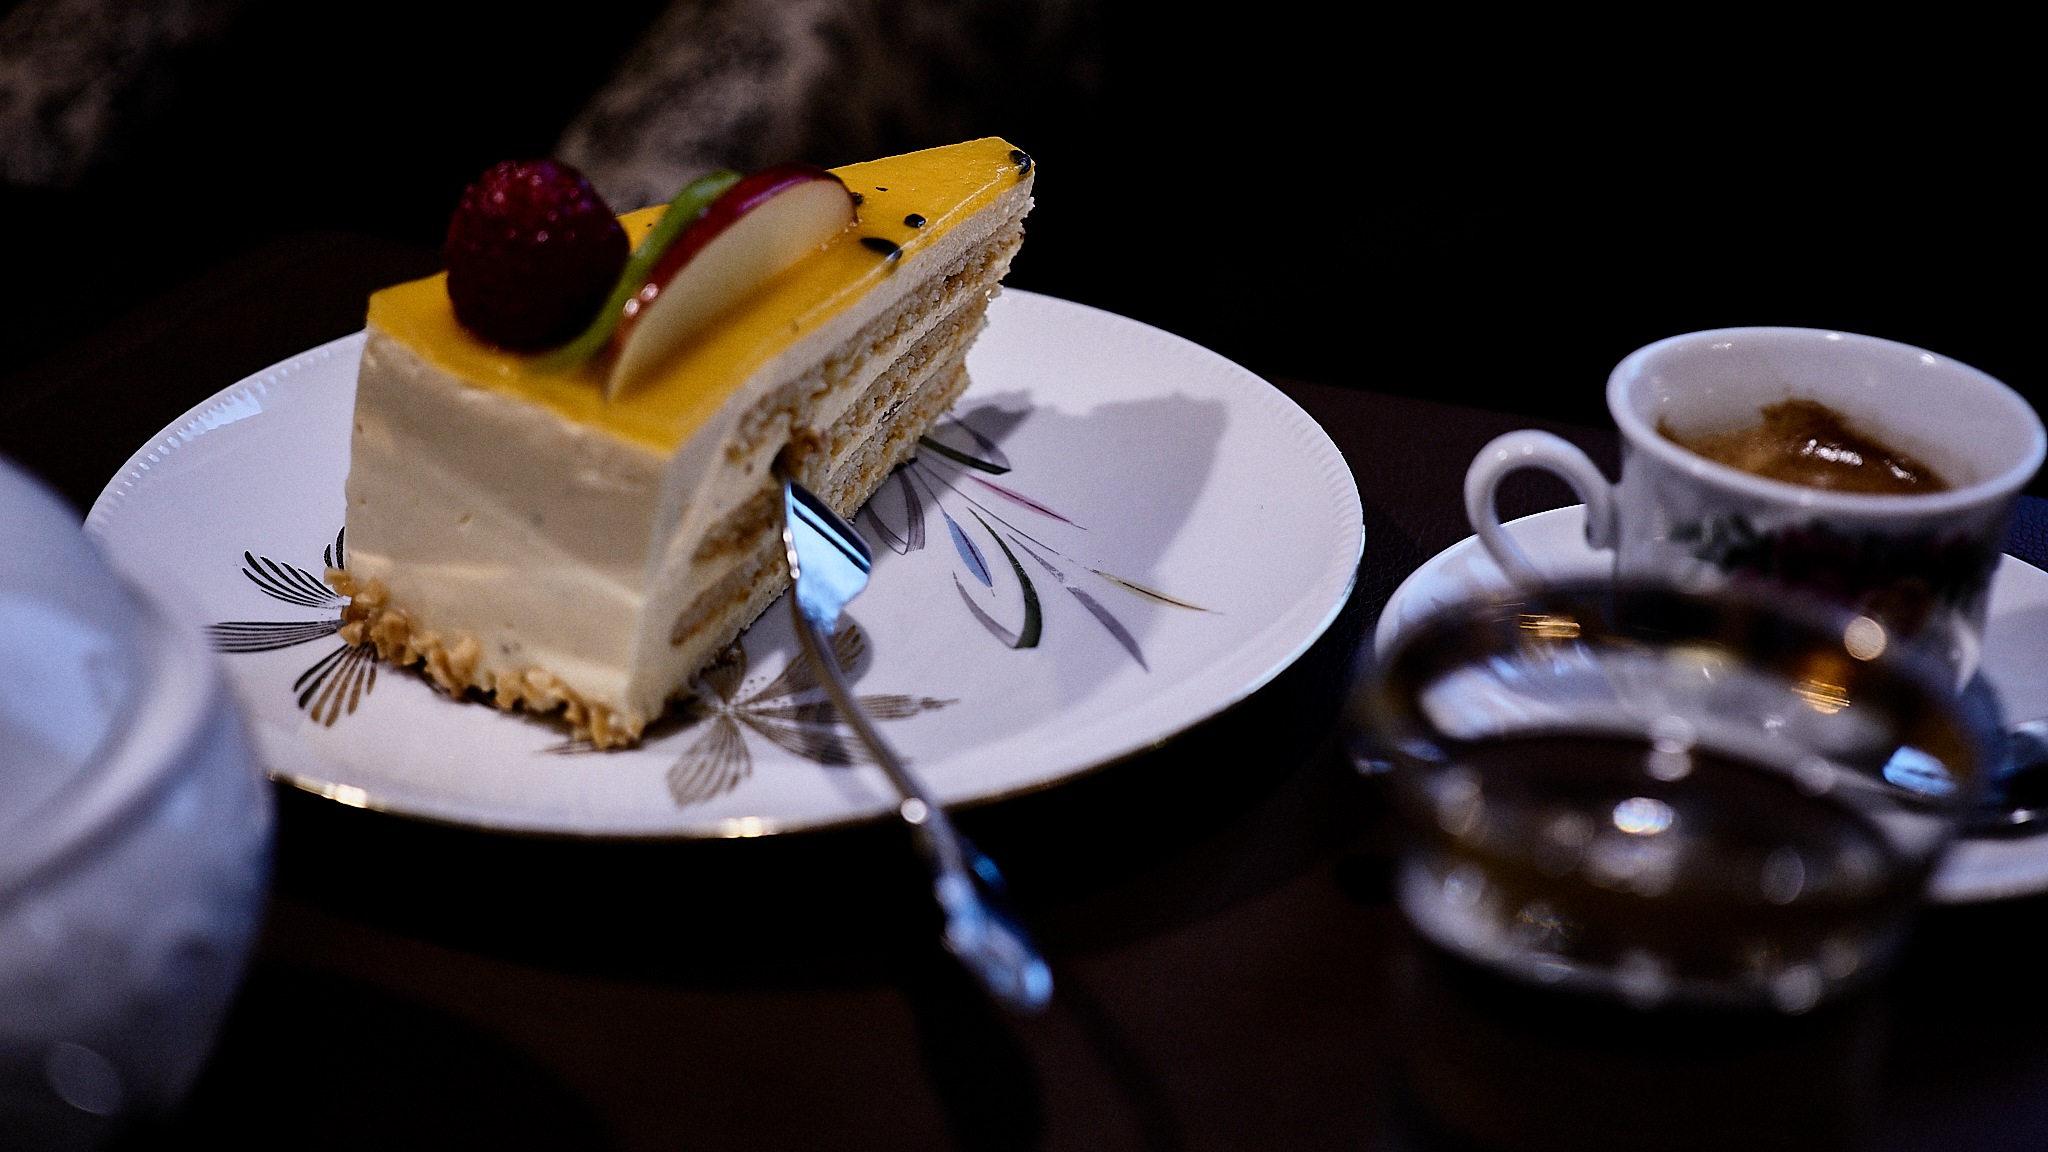 Enjoying in the café by Peter Buck